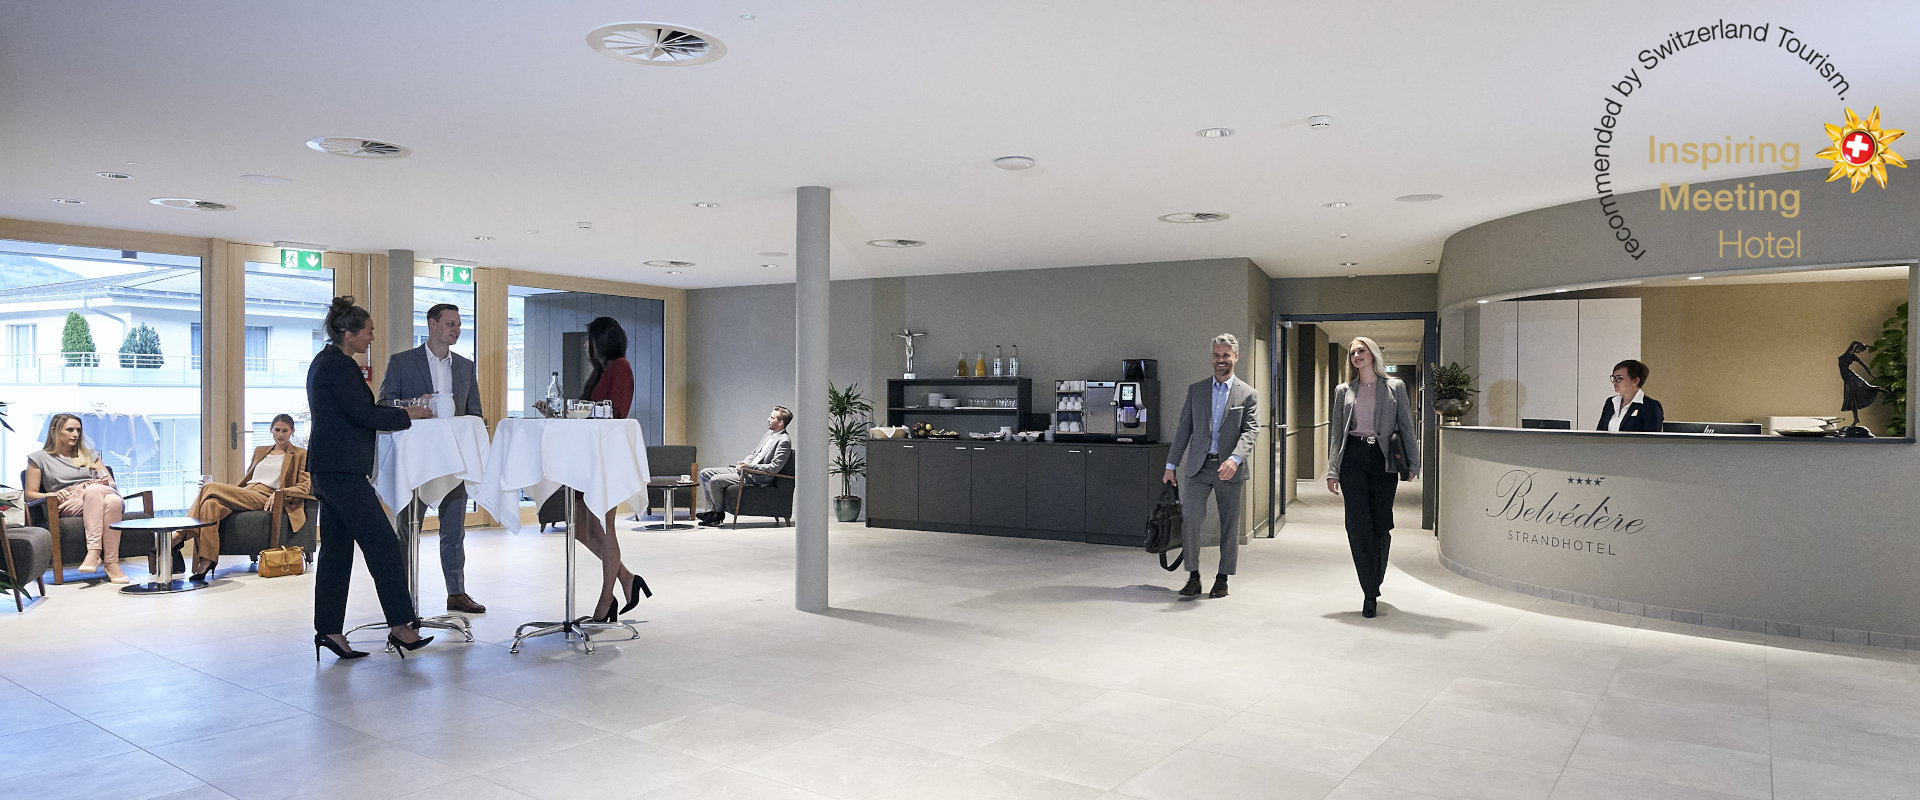 Lobby Seminartrakt im Belvédère Strandhotel